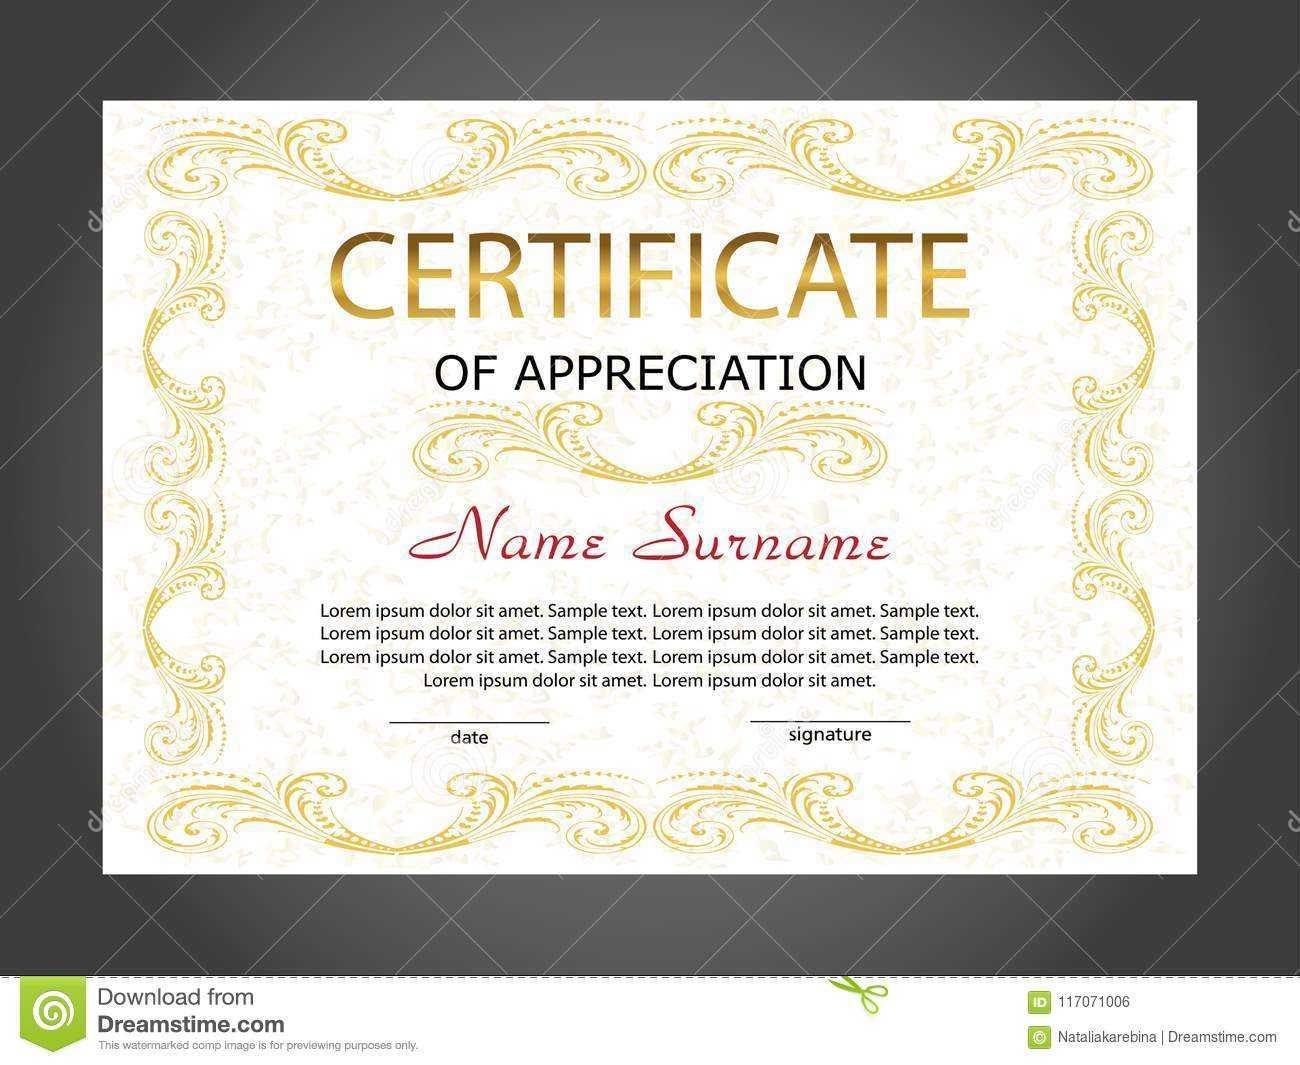 Certificate Of Appreciation, Diploma Template. Reward. Award Pertaining To Winner Certificate Template